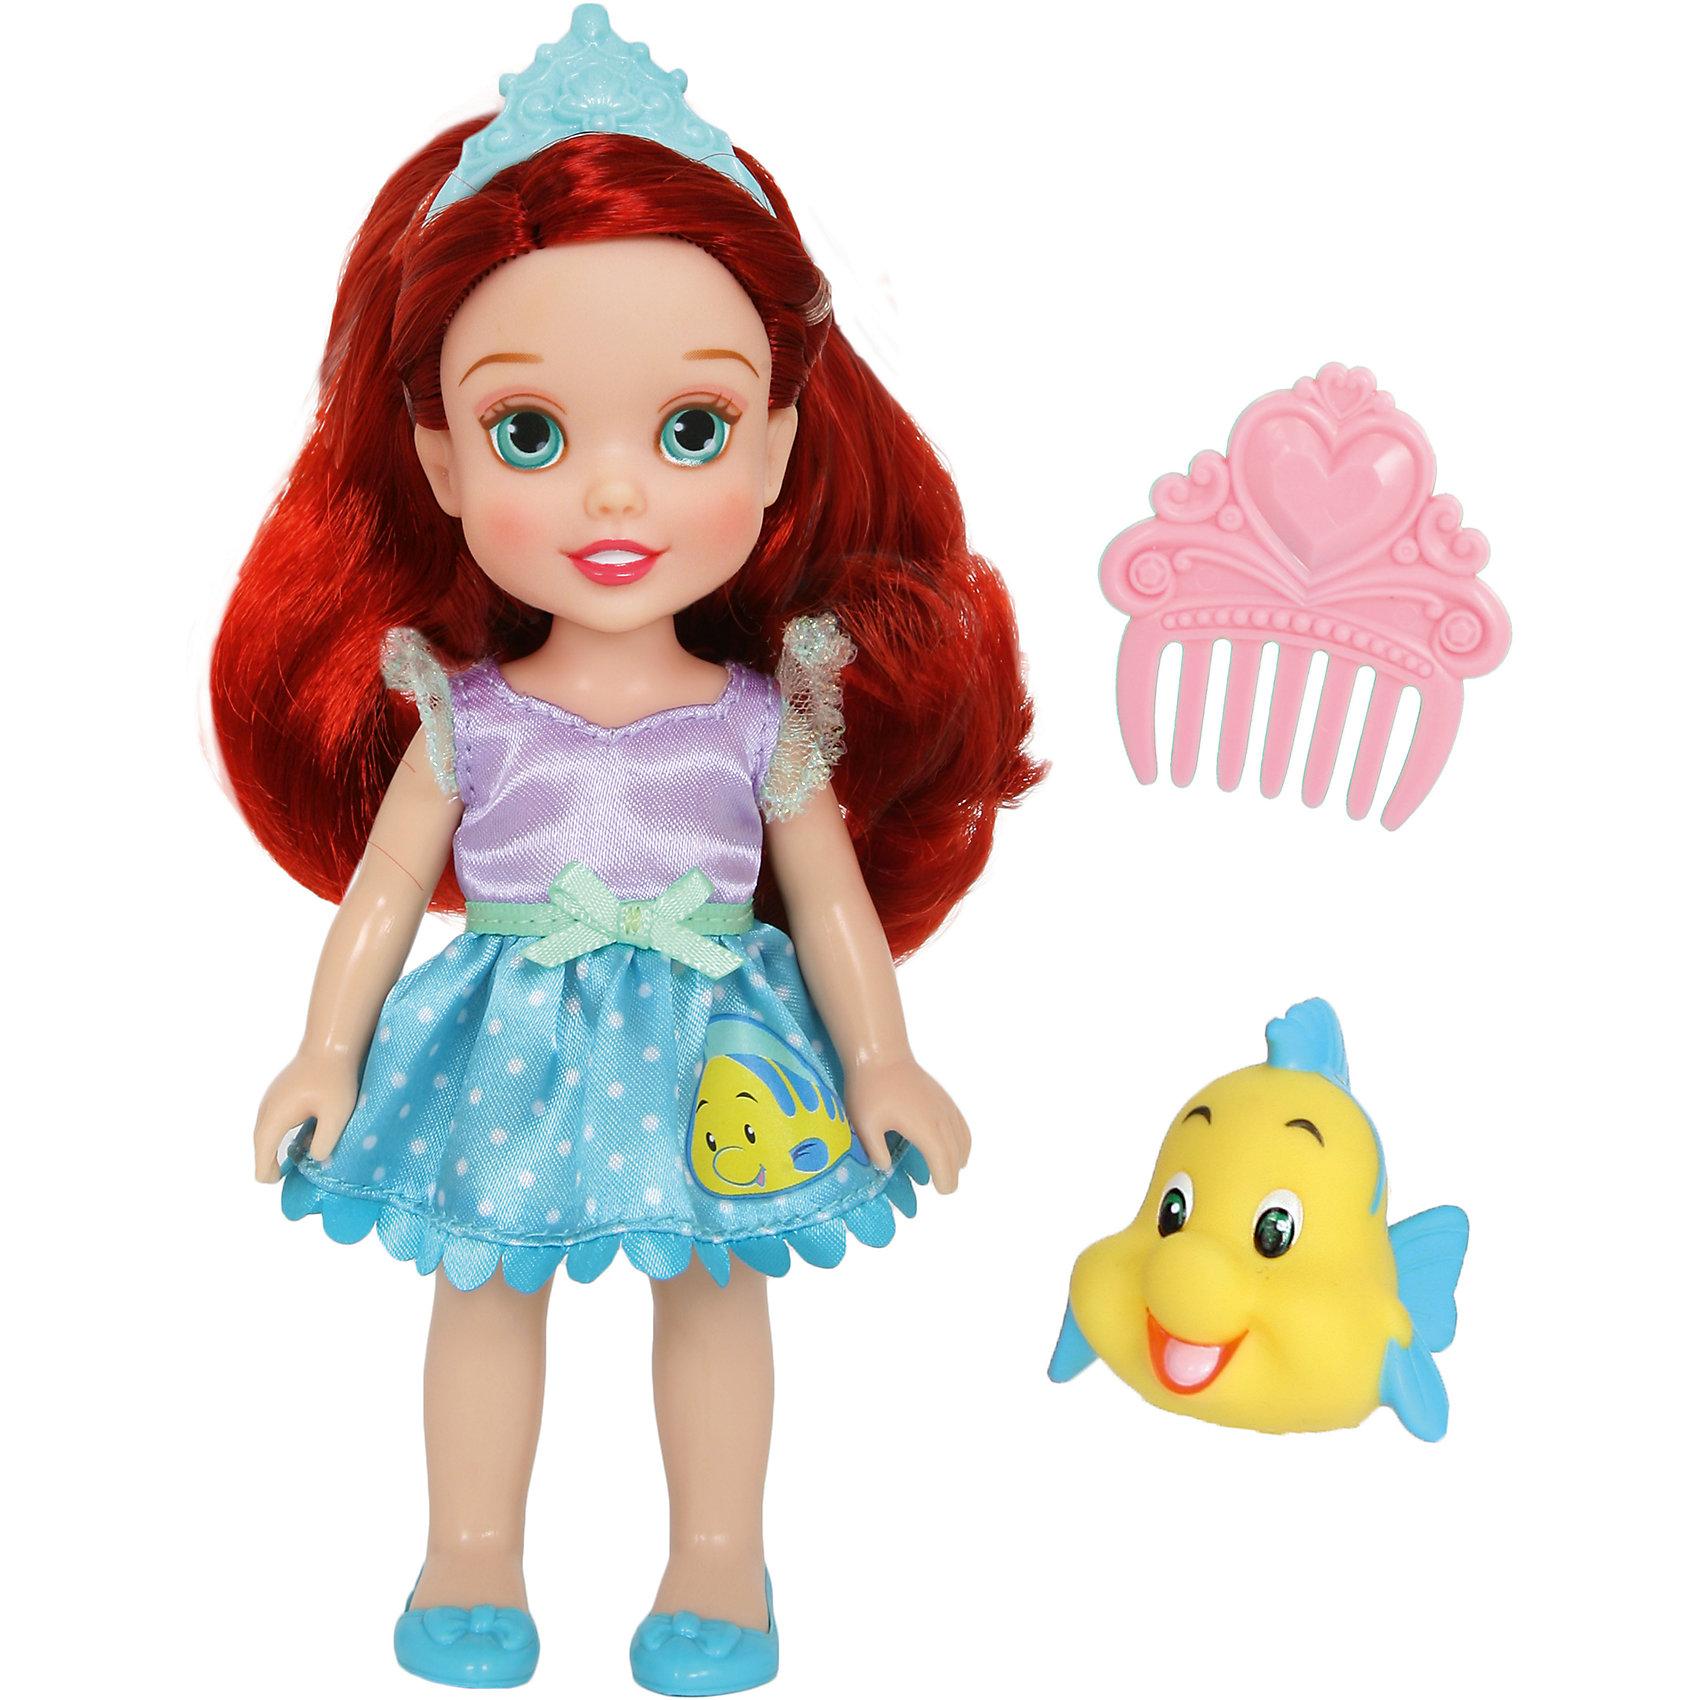 Disney Кукла  Малышка с питомцем: Ариэль, 15 см, Disney Princess куклы карапуз кукла disney принцесса ариэль